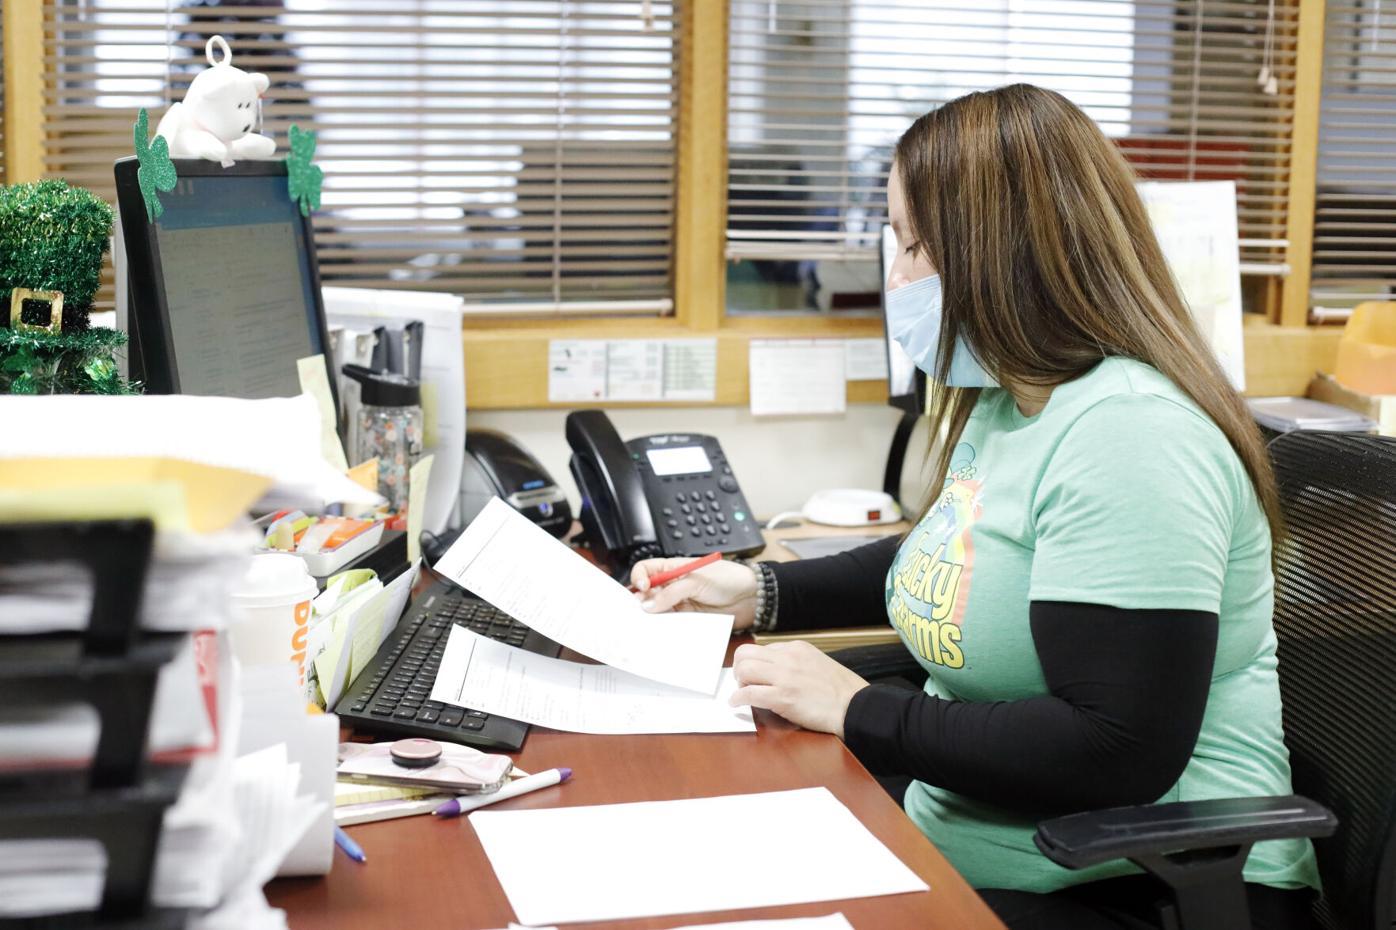 Senior Center Vaccintion Help 2